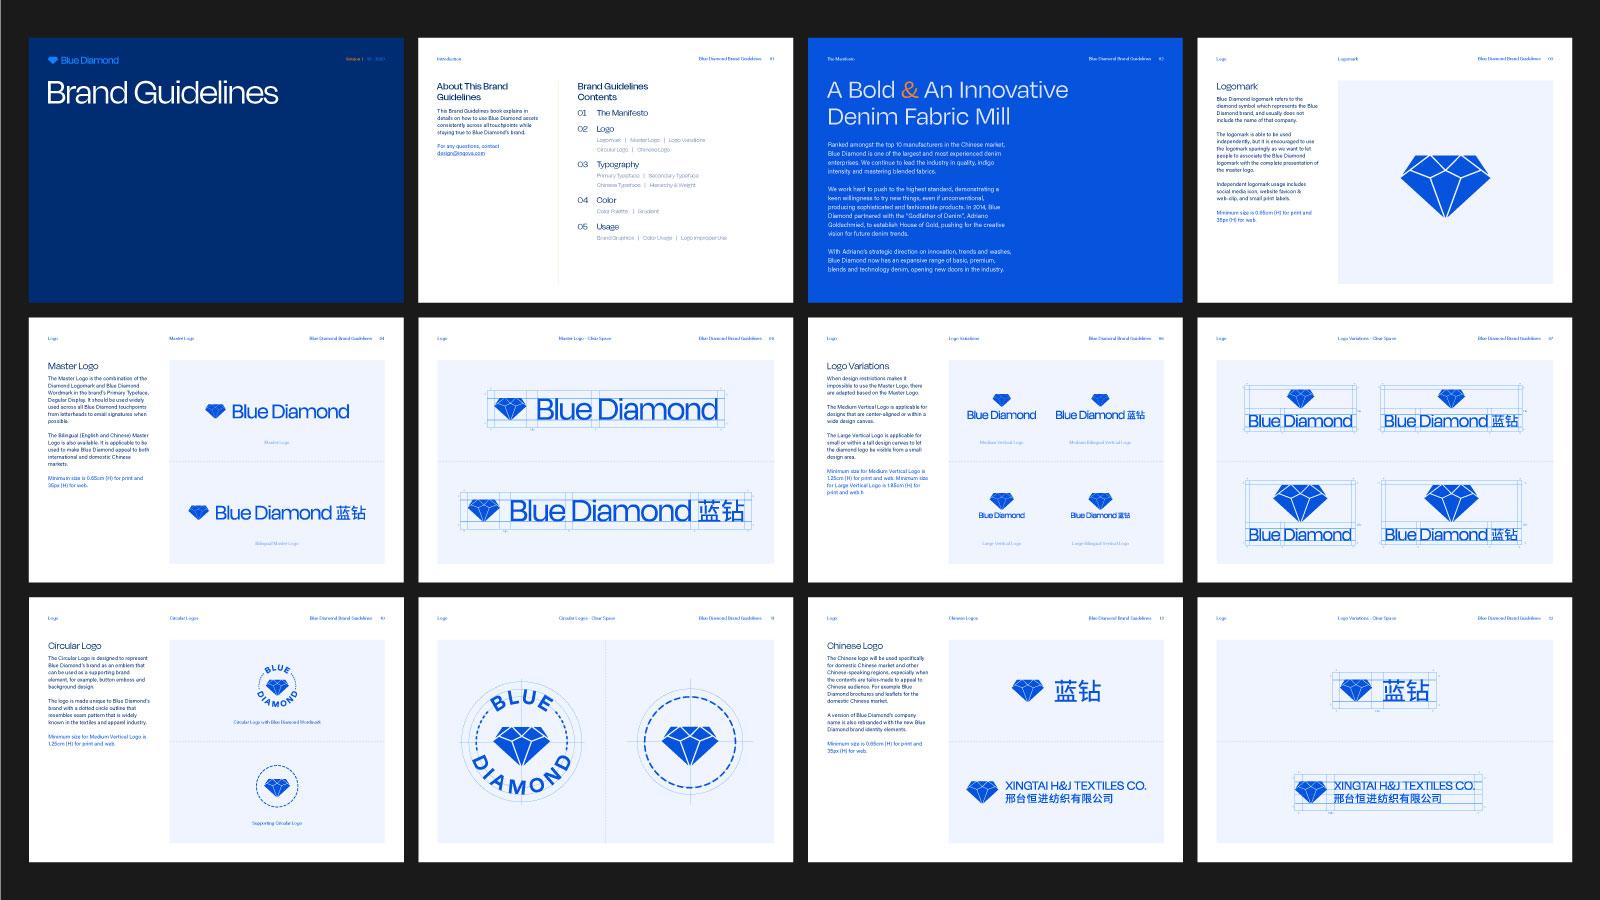 Blue Diamond brand guidelines